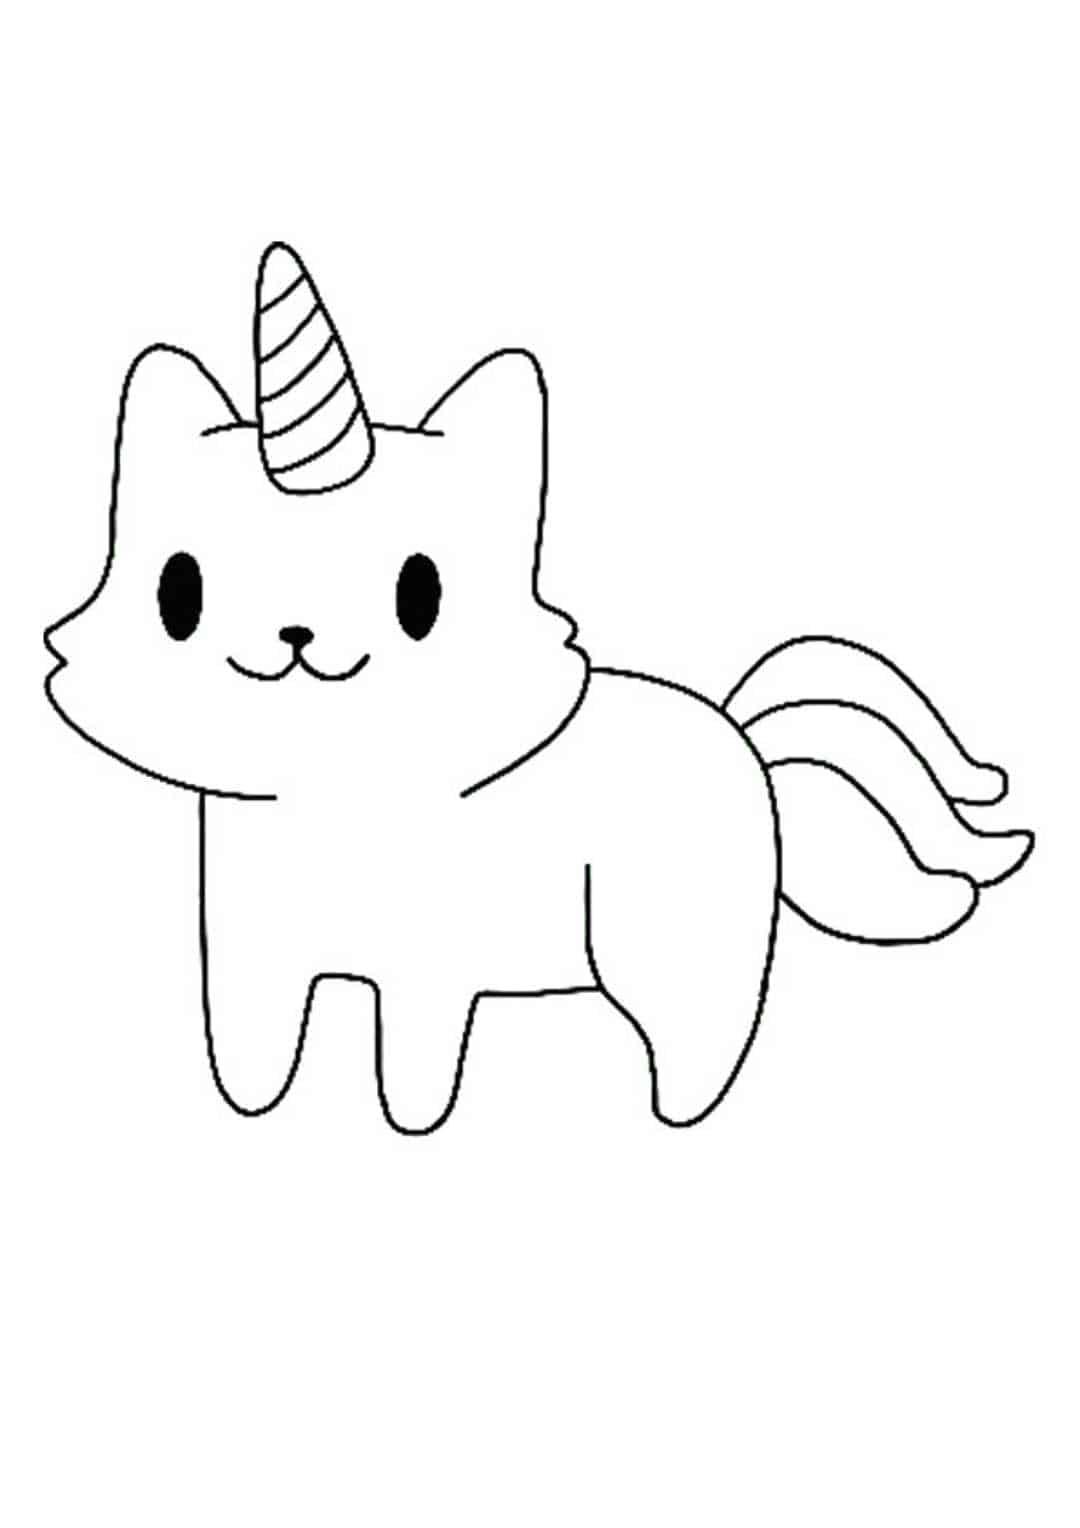 Cute little cat unicorn coloring page